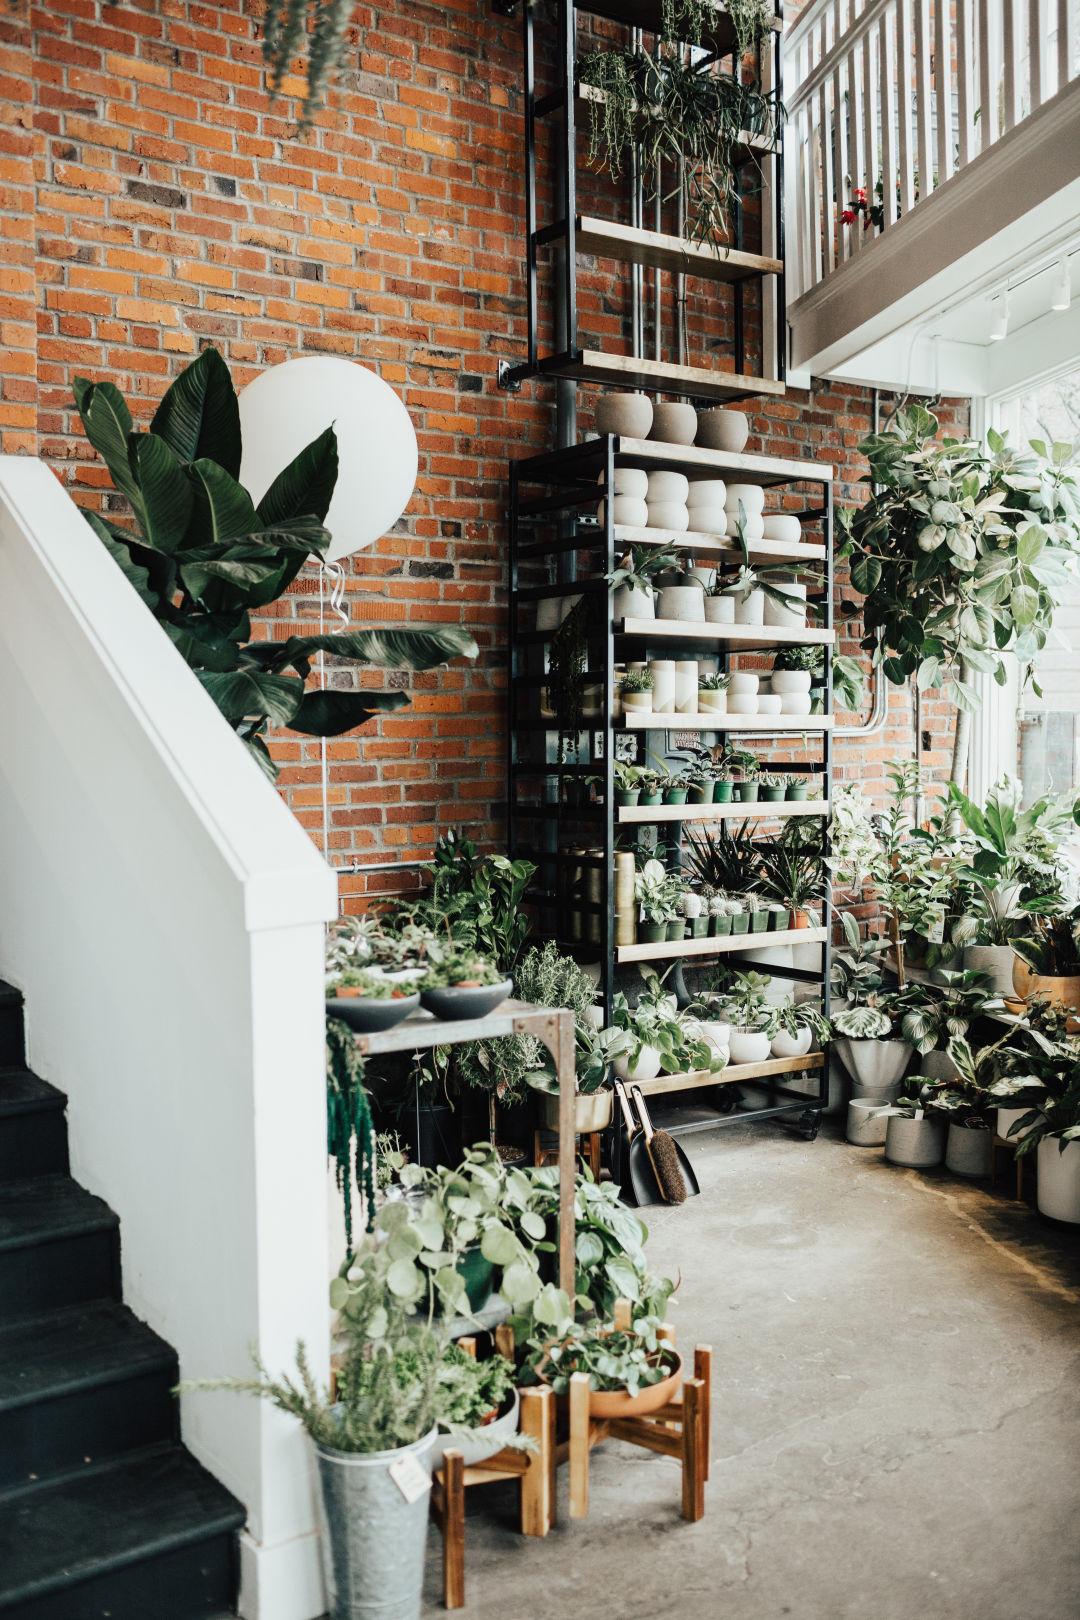 9 Seattle Plant Shops to Create an Indoor Jungle | Seattle Met on indoor bonsai plants, container flower garden design, indoor plants for bathrooms, plant rooms design, indoor plants and landscaping,